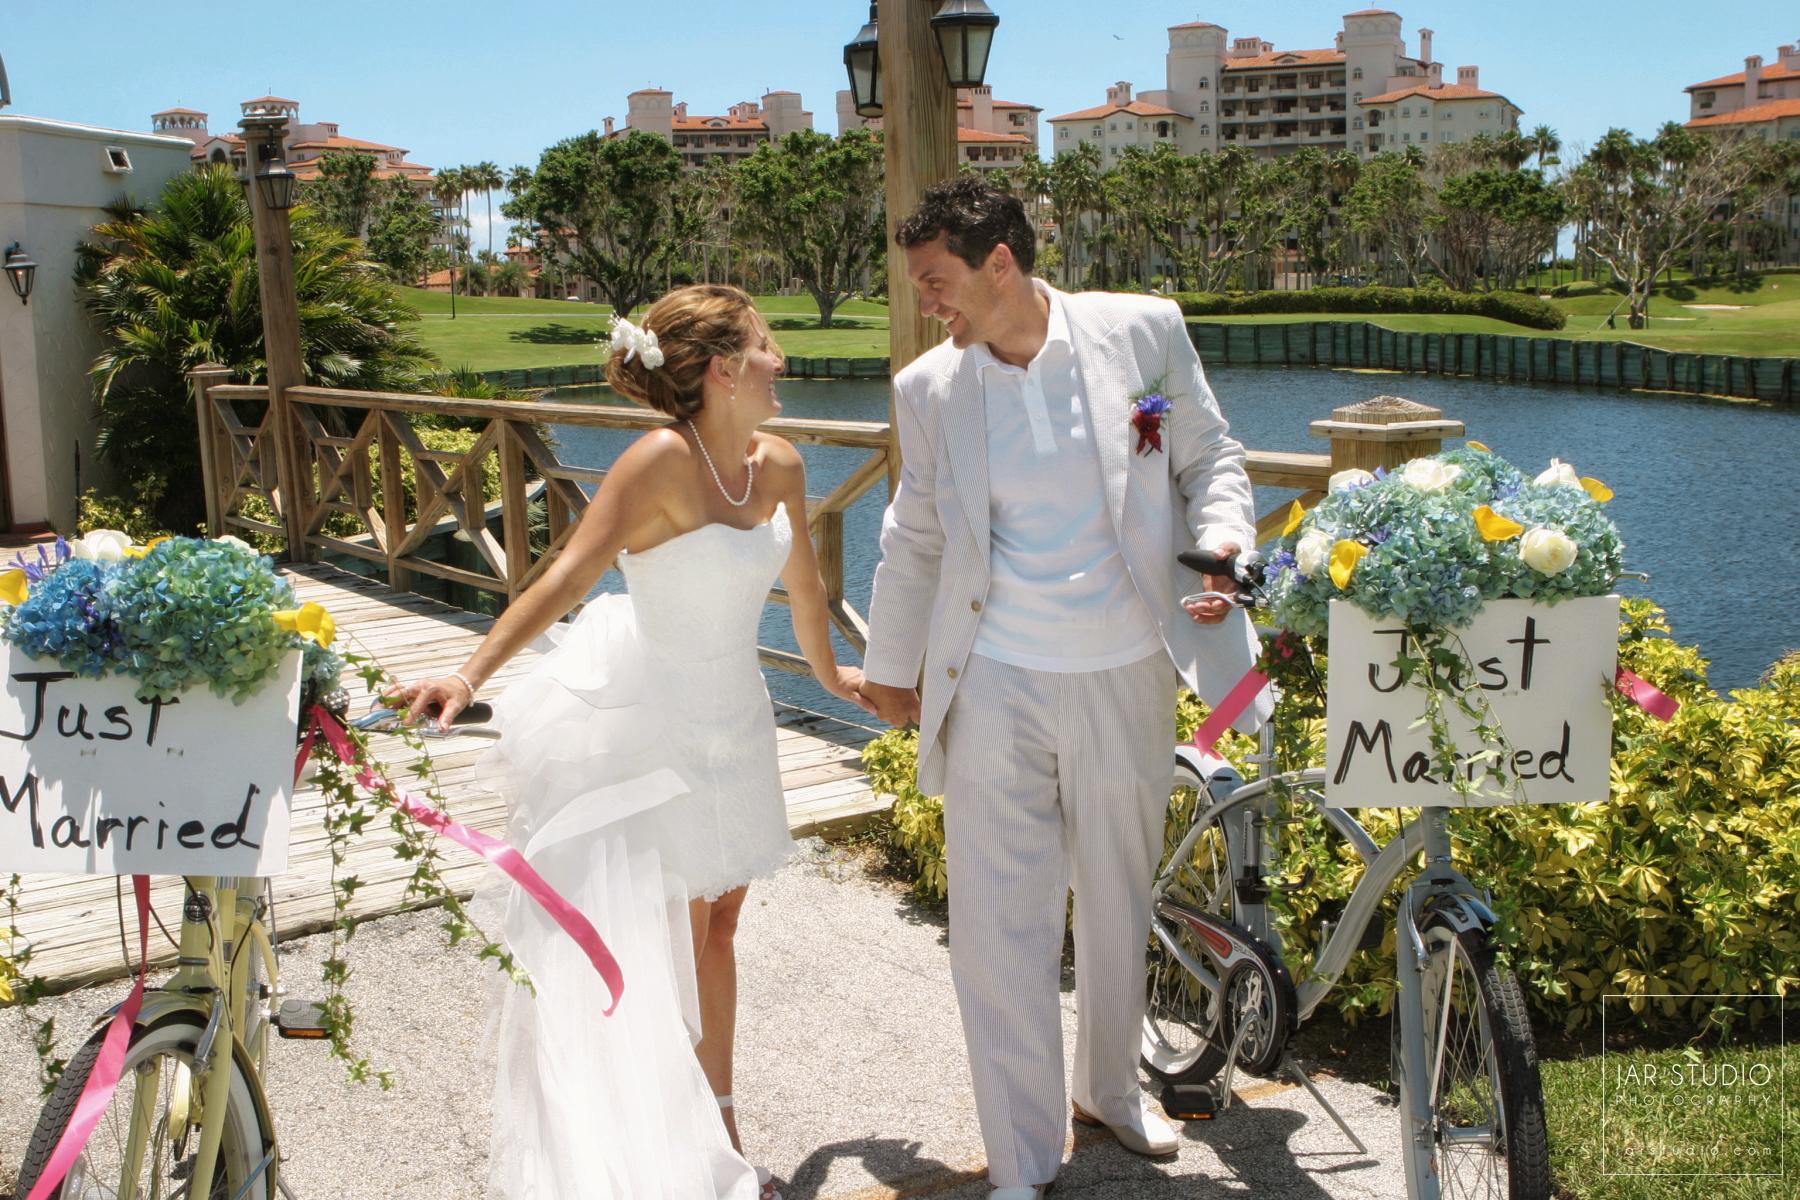 jarstudio-fisherisland-club-wedding-photographer (17).JPG